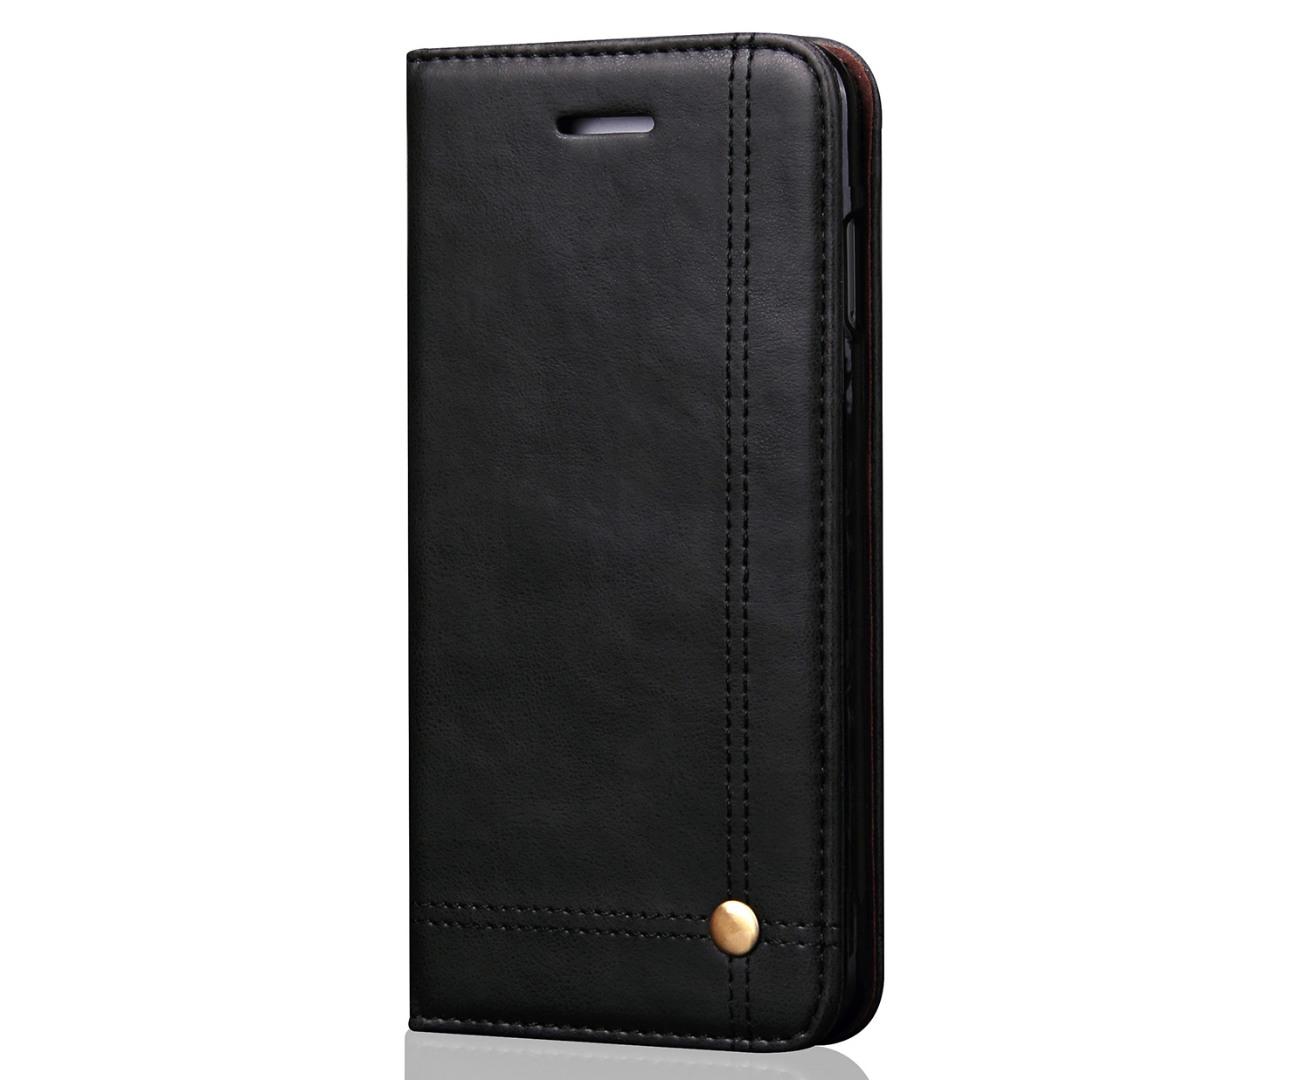 Husa piele, tip portofel, cusaturi ornamentale, stand, inchidere magnetica, iPhone 8 Plus / 7 Plus - CaseMe, Negru